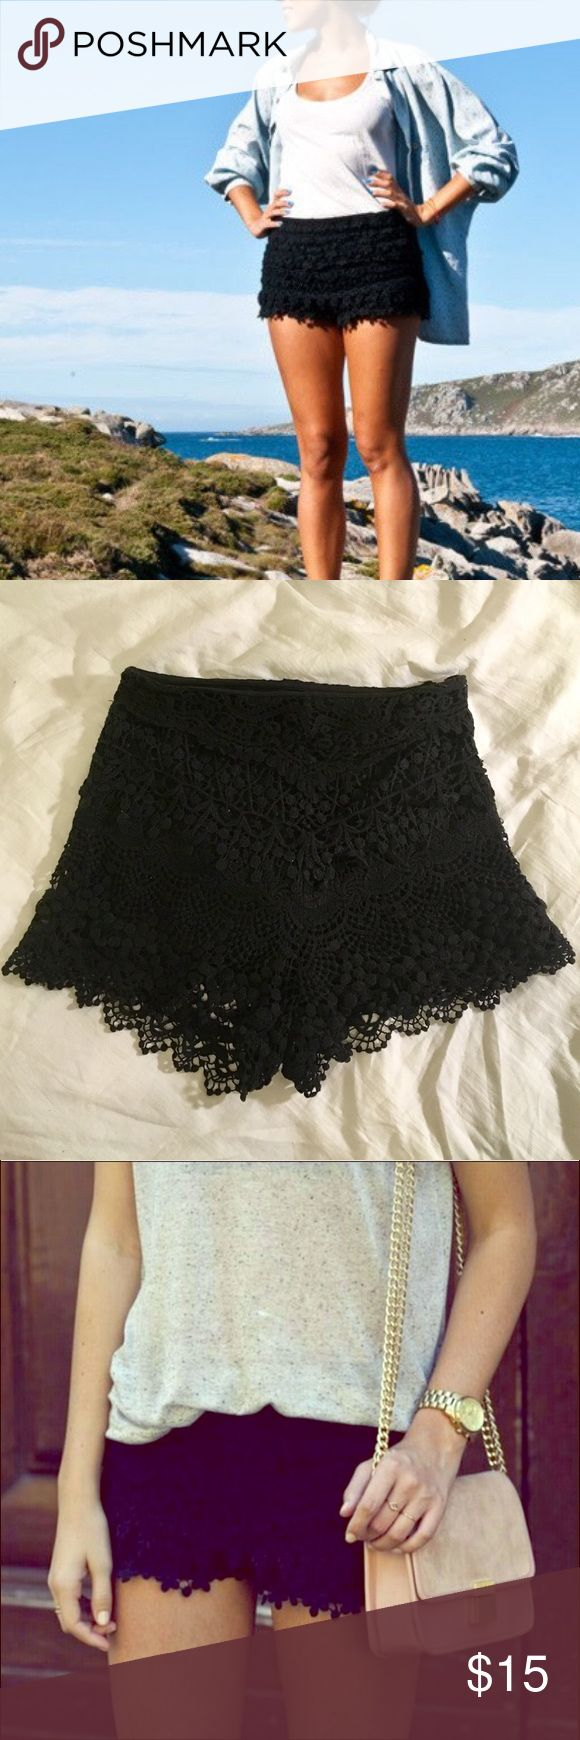 Black crochet shorts Black crochet shorts from urban outfitters Urban Outfitters Shorts